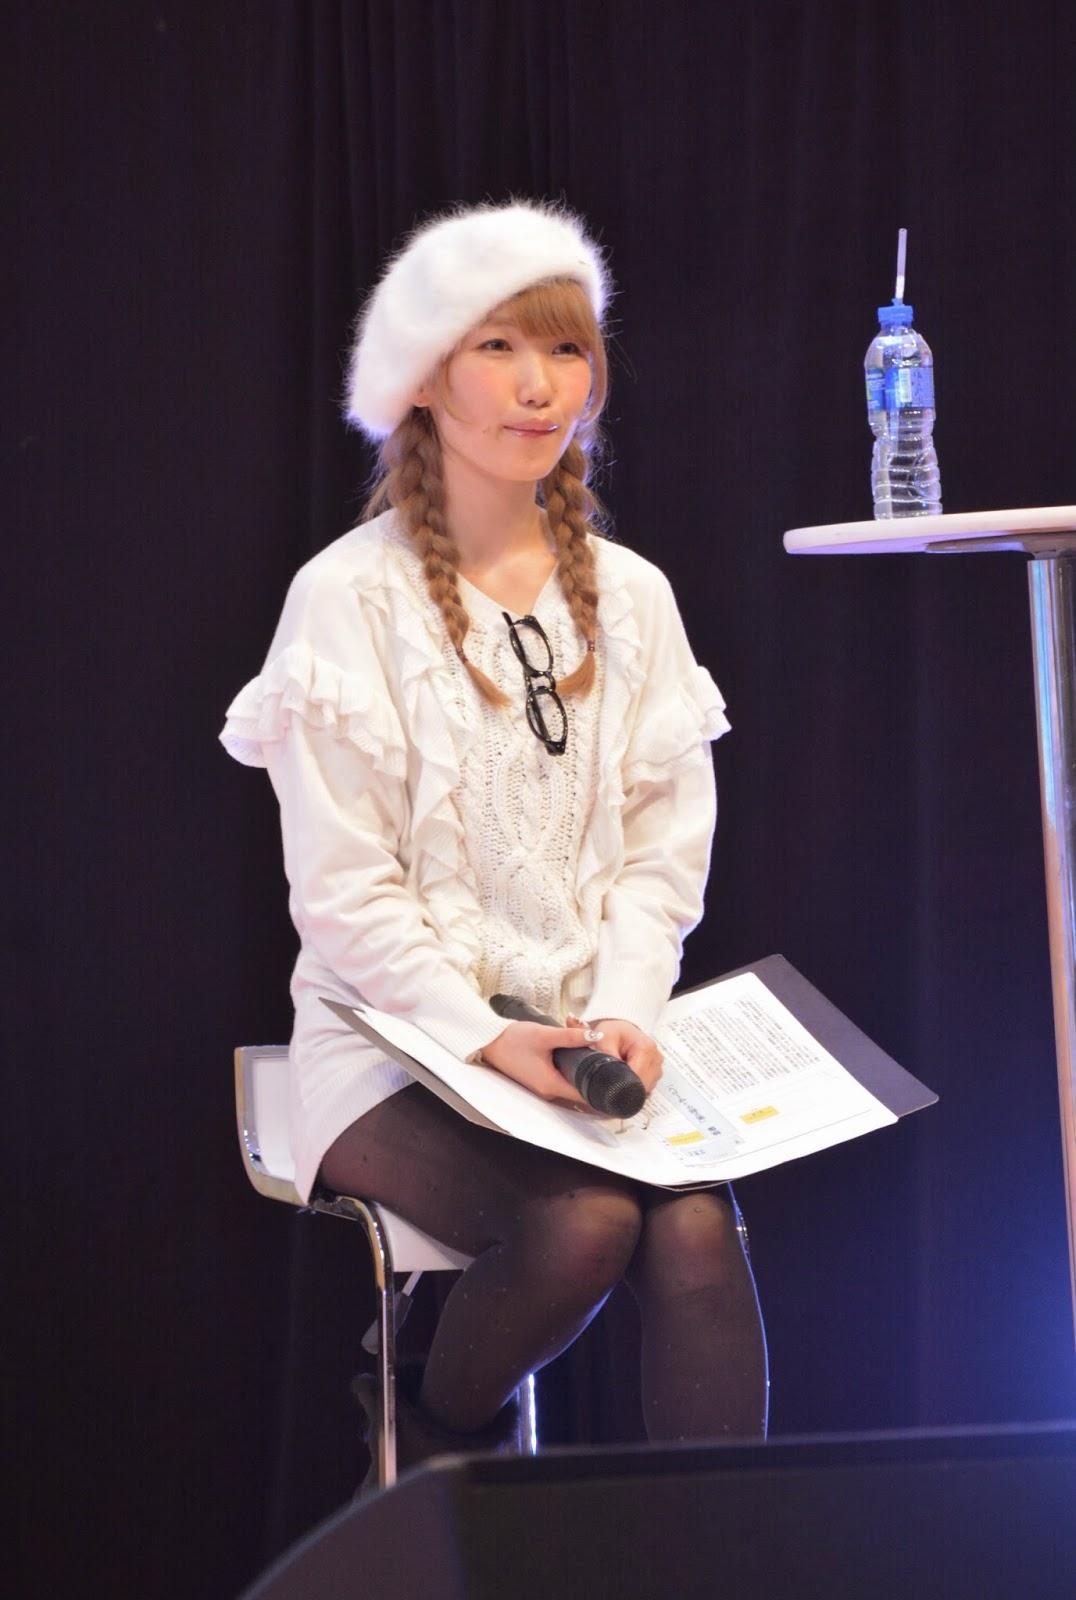 [C3HK] 內田彩有什麼話要對粉絲們說?   SOS BLOG:動漫生活方式